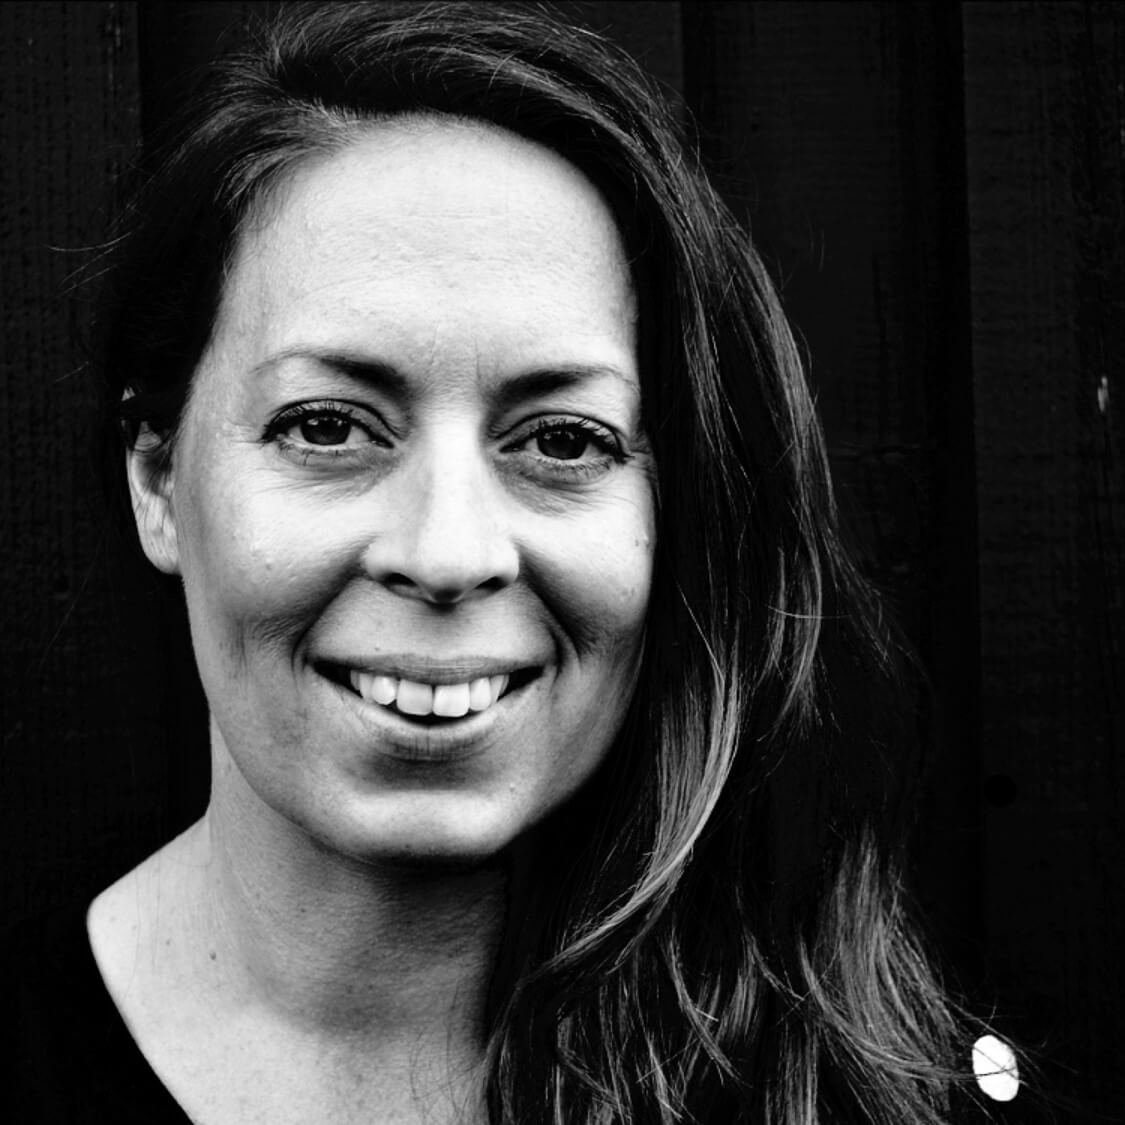 Karoline Jonsson